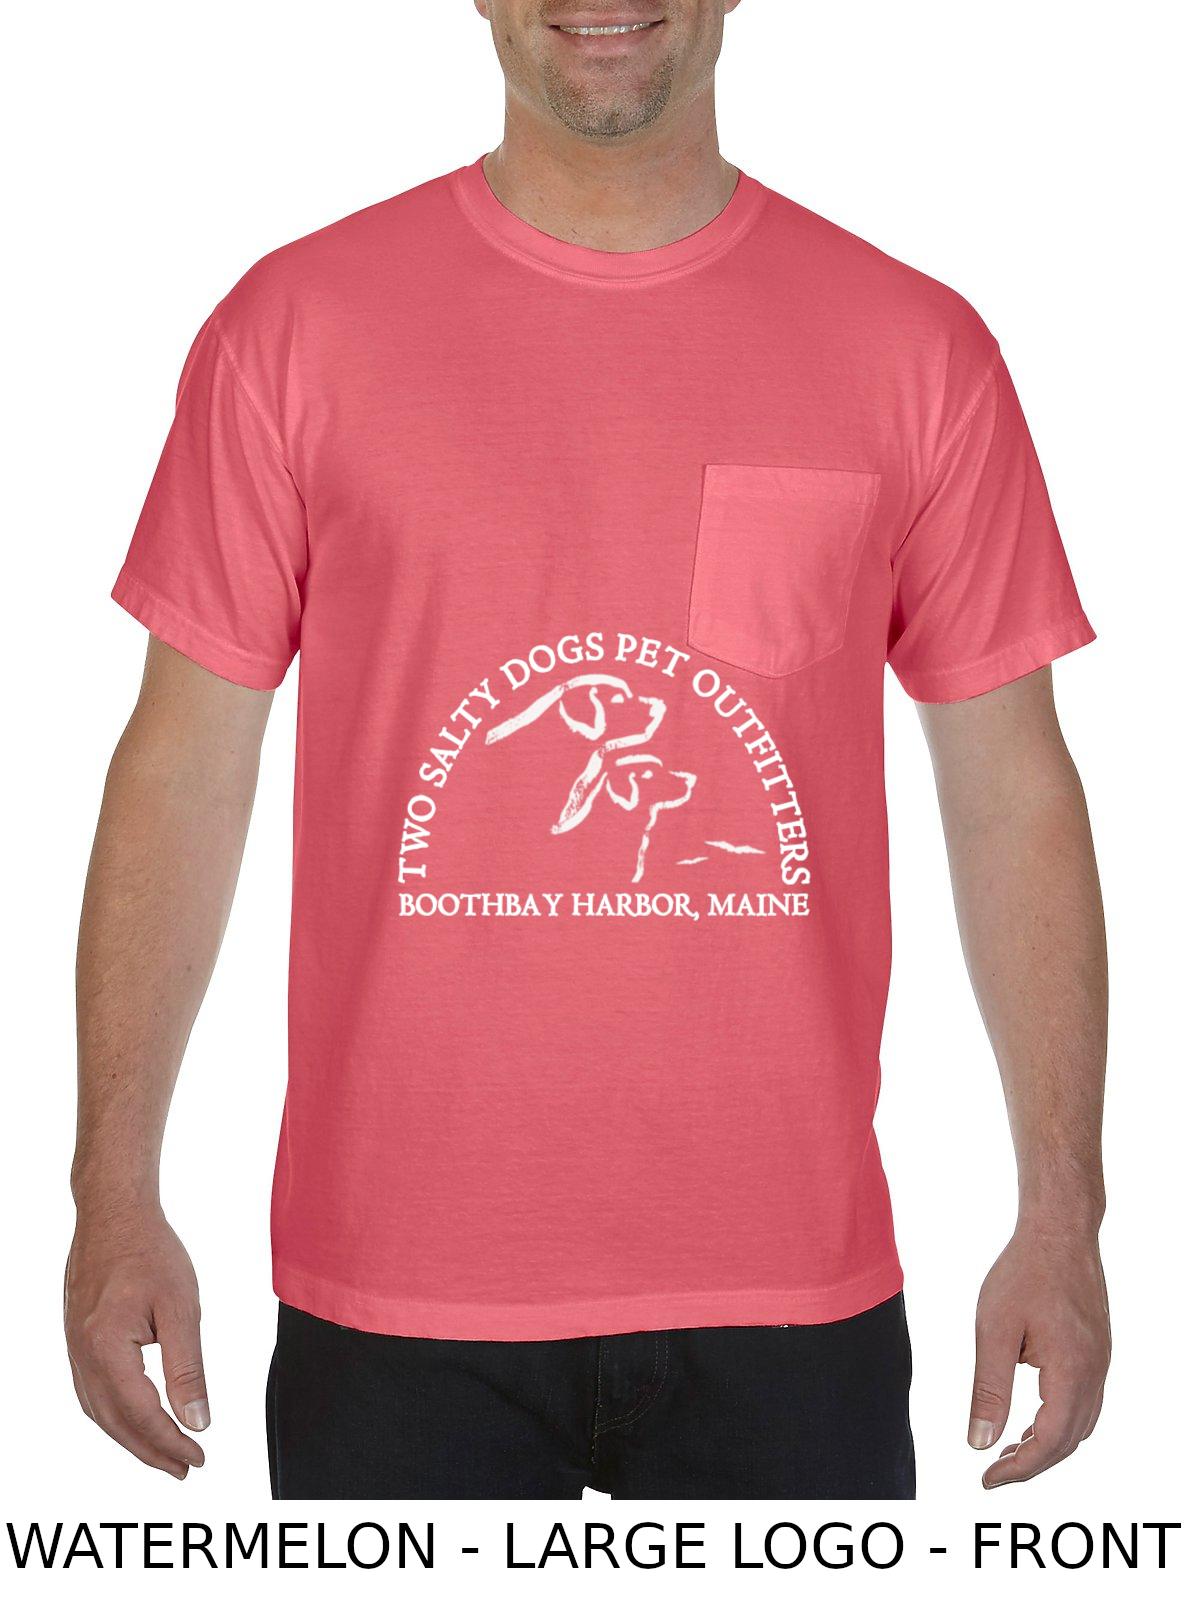 bbha-ss-t-shirt-pocket-watermelon-front